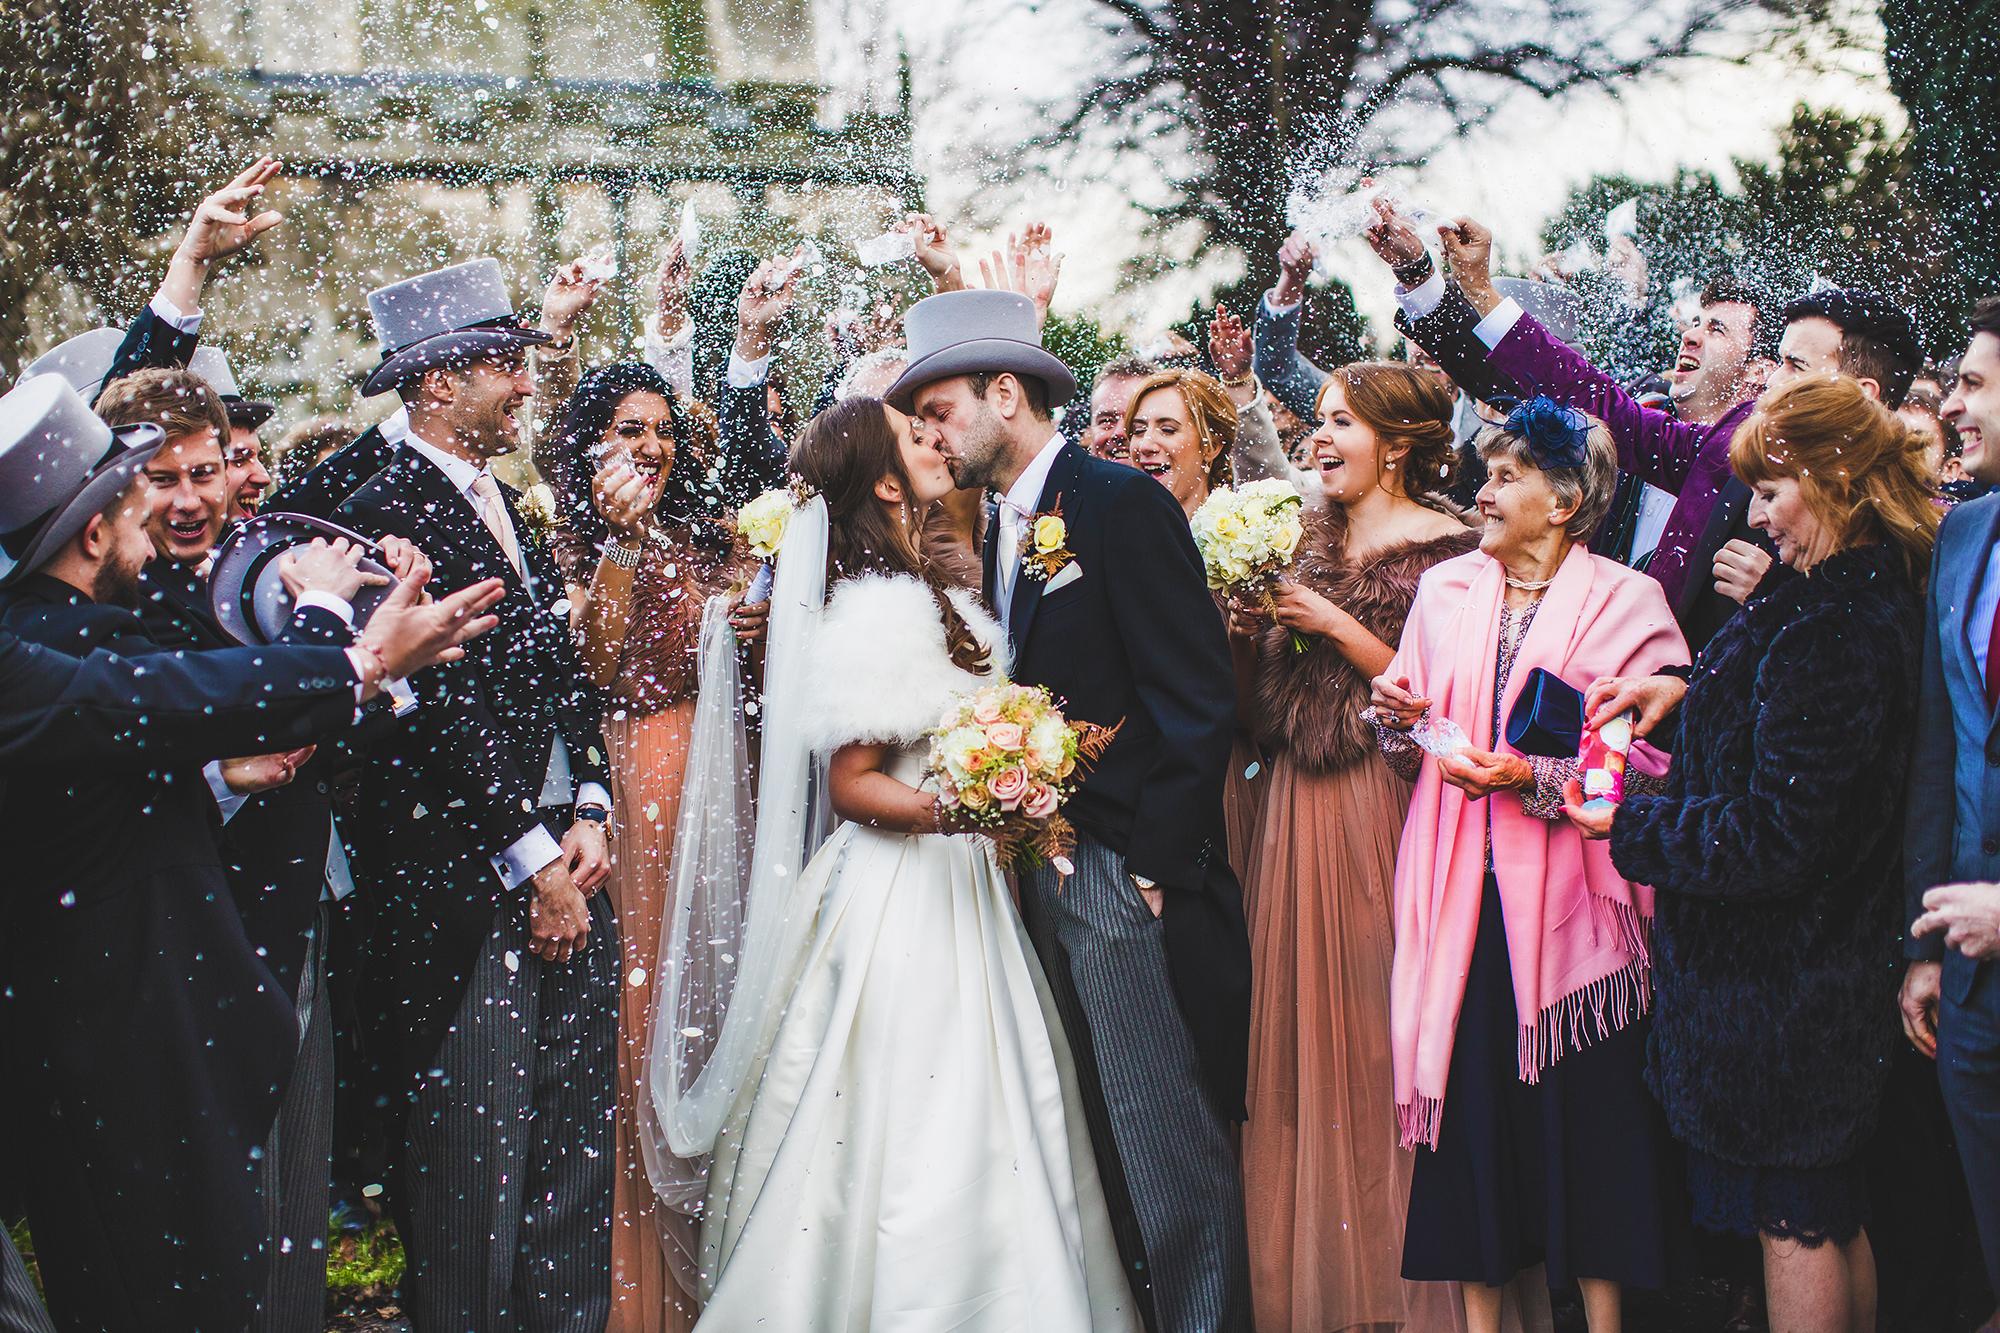 rossington hall wedding photographers doncaster.jpg